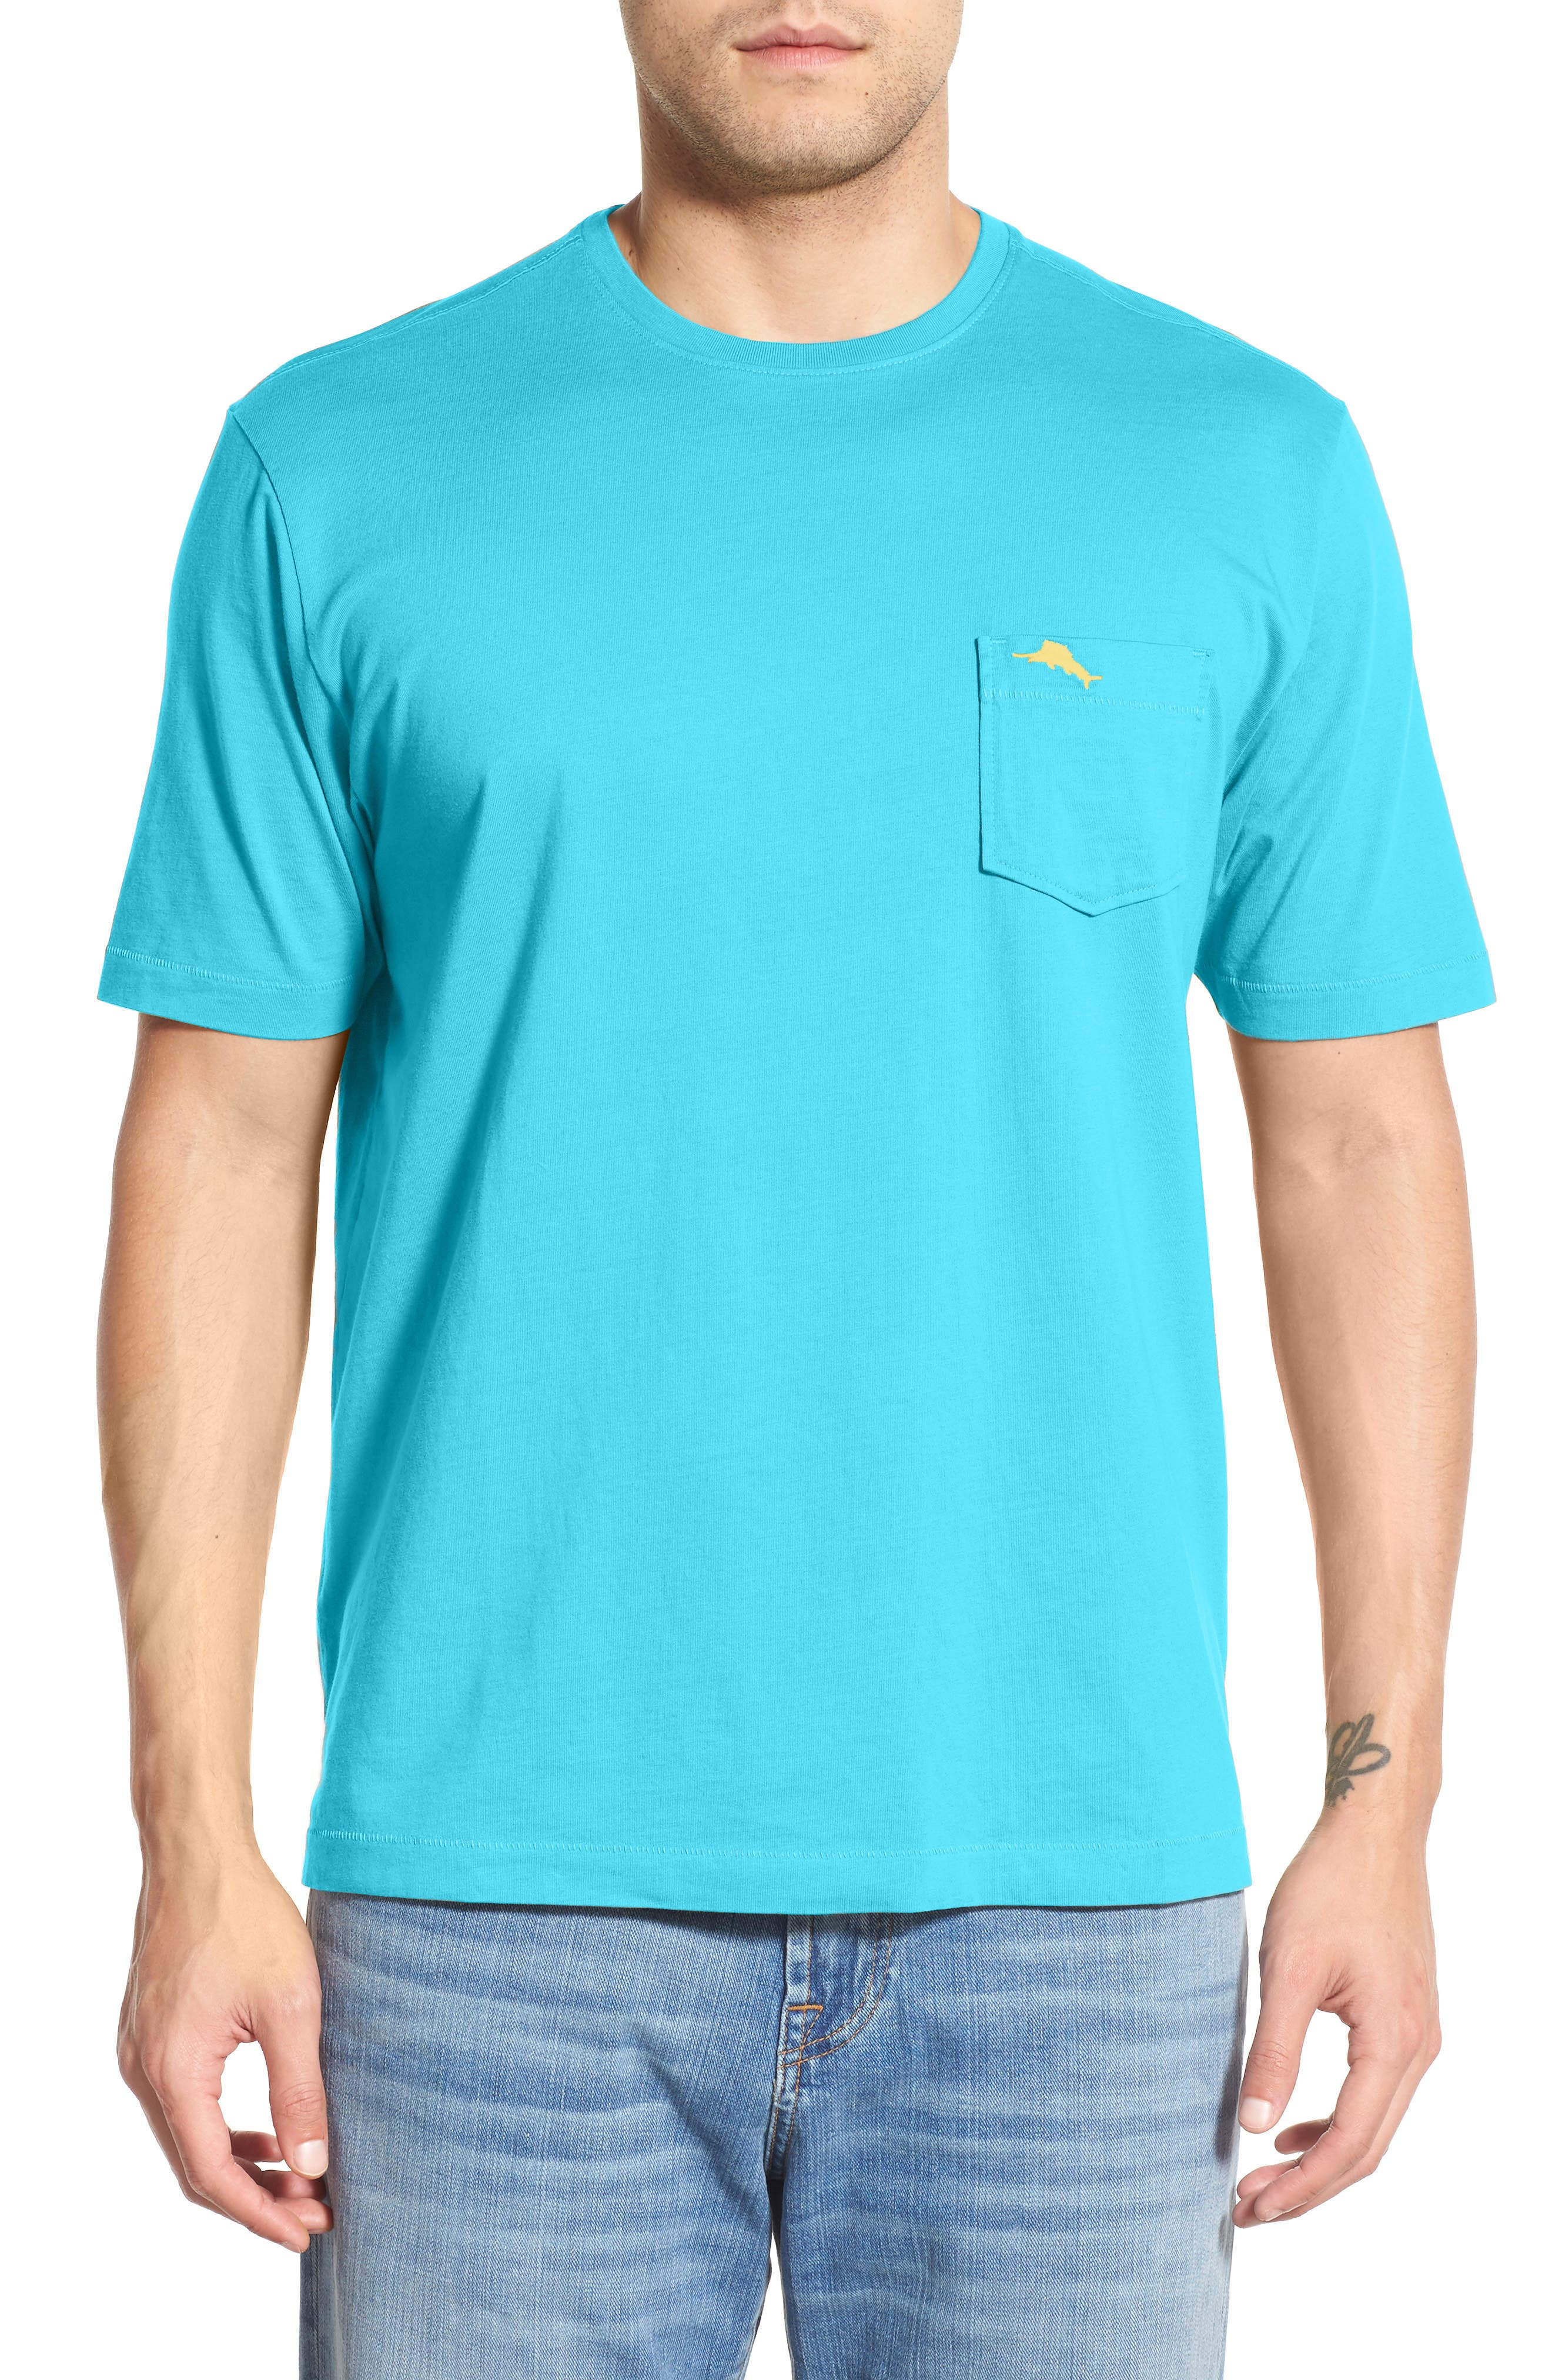 Bali Skyline T-Shirt,                         Main,                         color, Aqua Mist